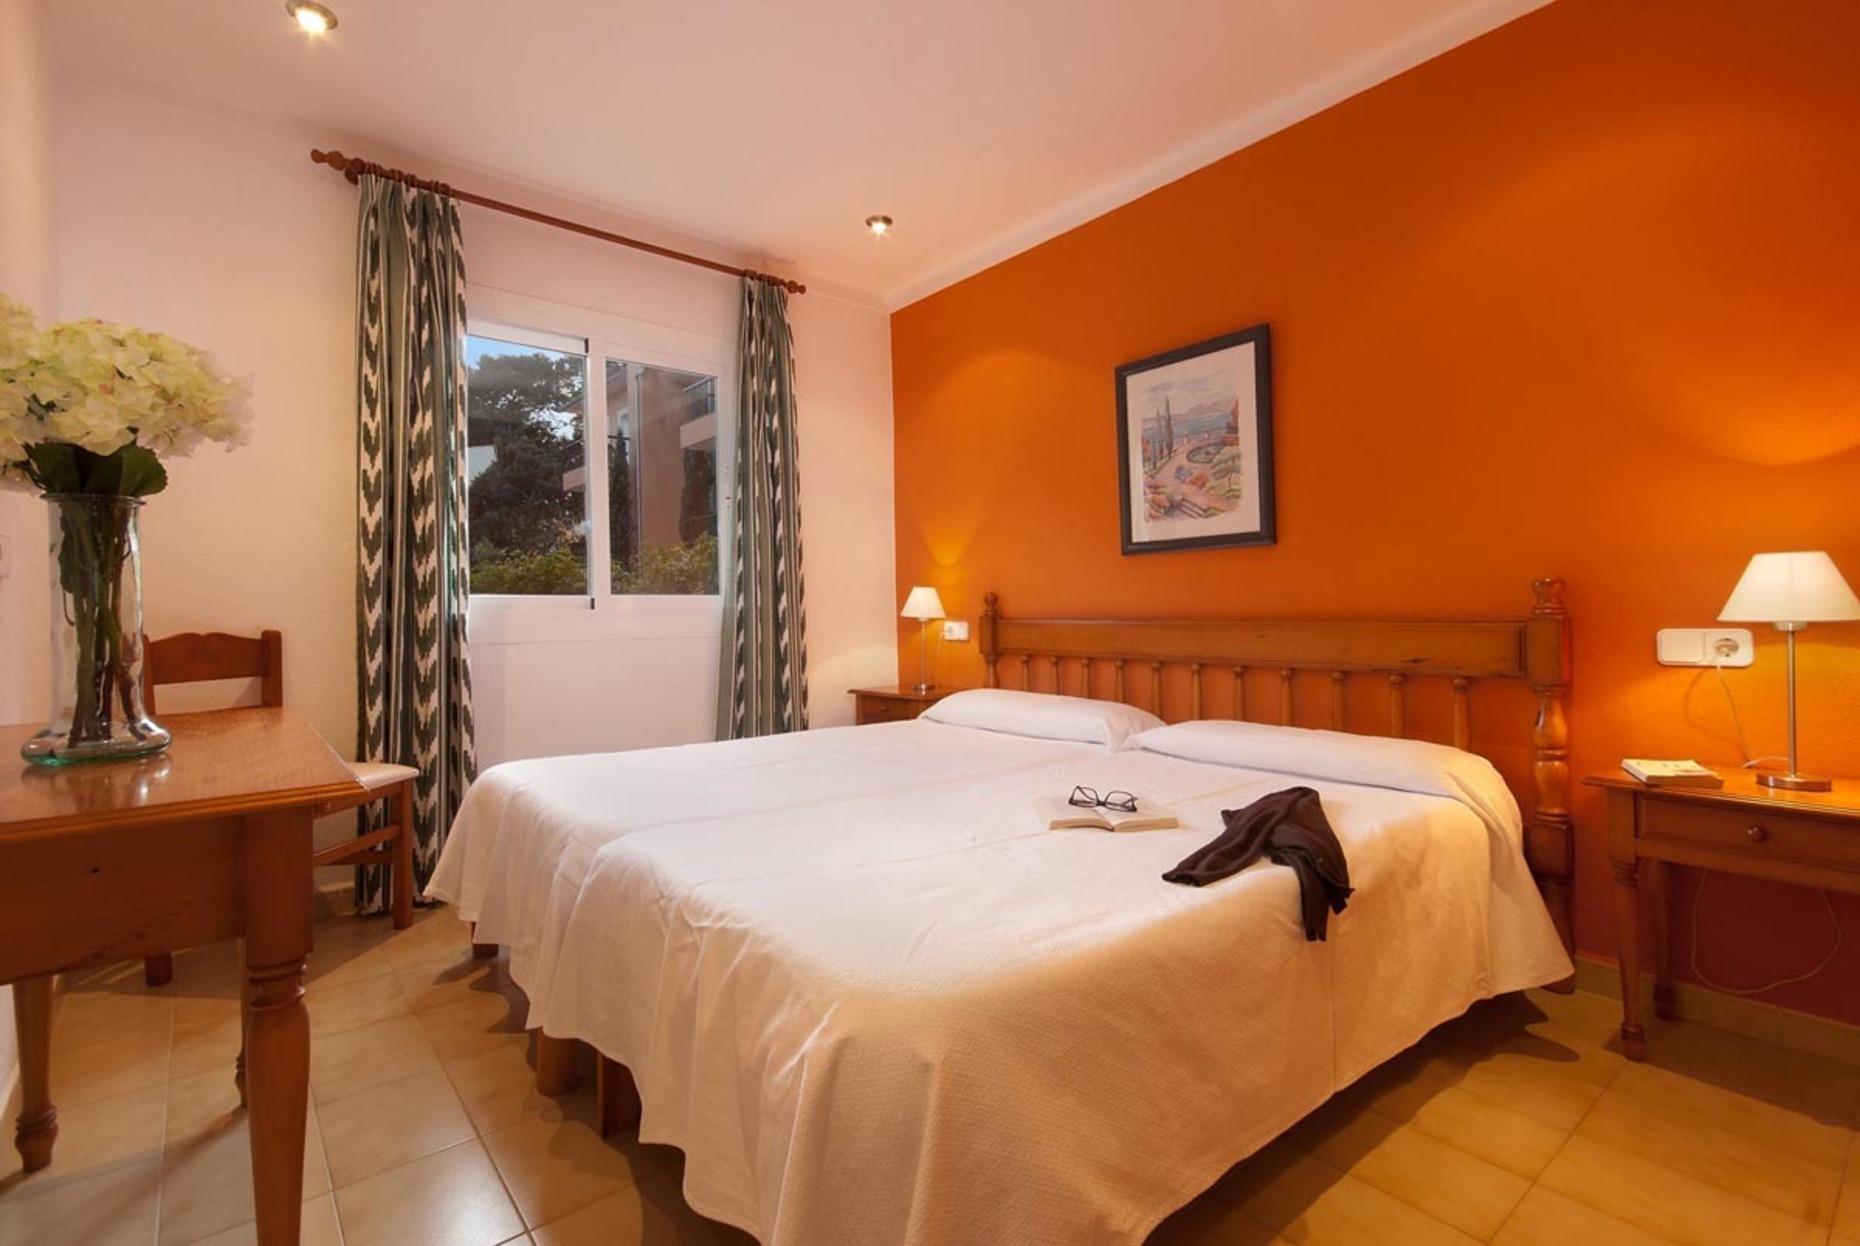 103219 -  Apartment in Cala Sant Vicenç